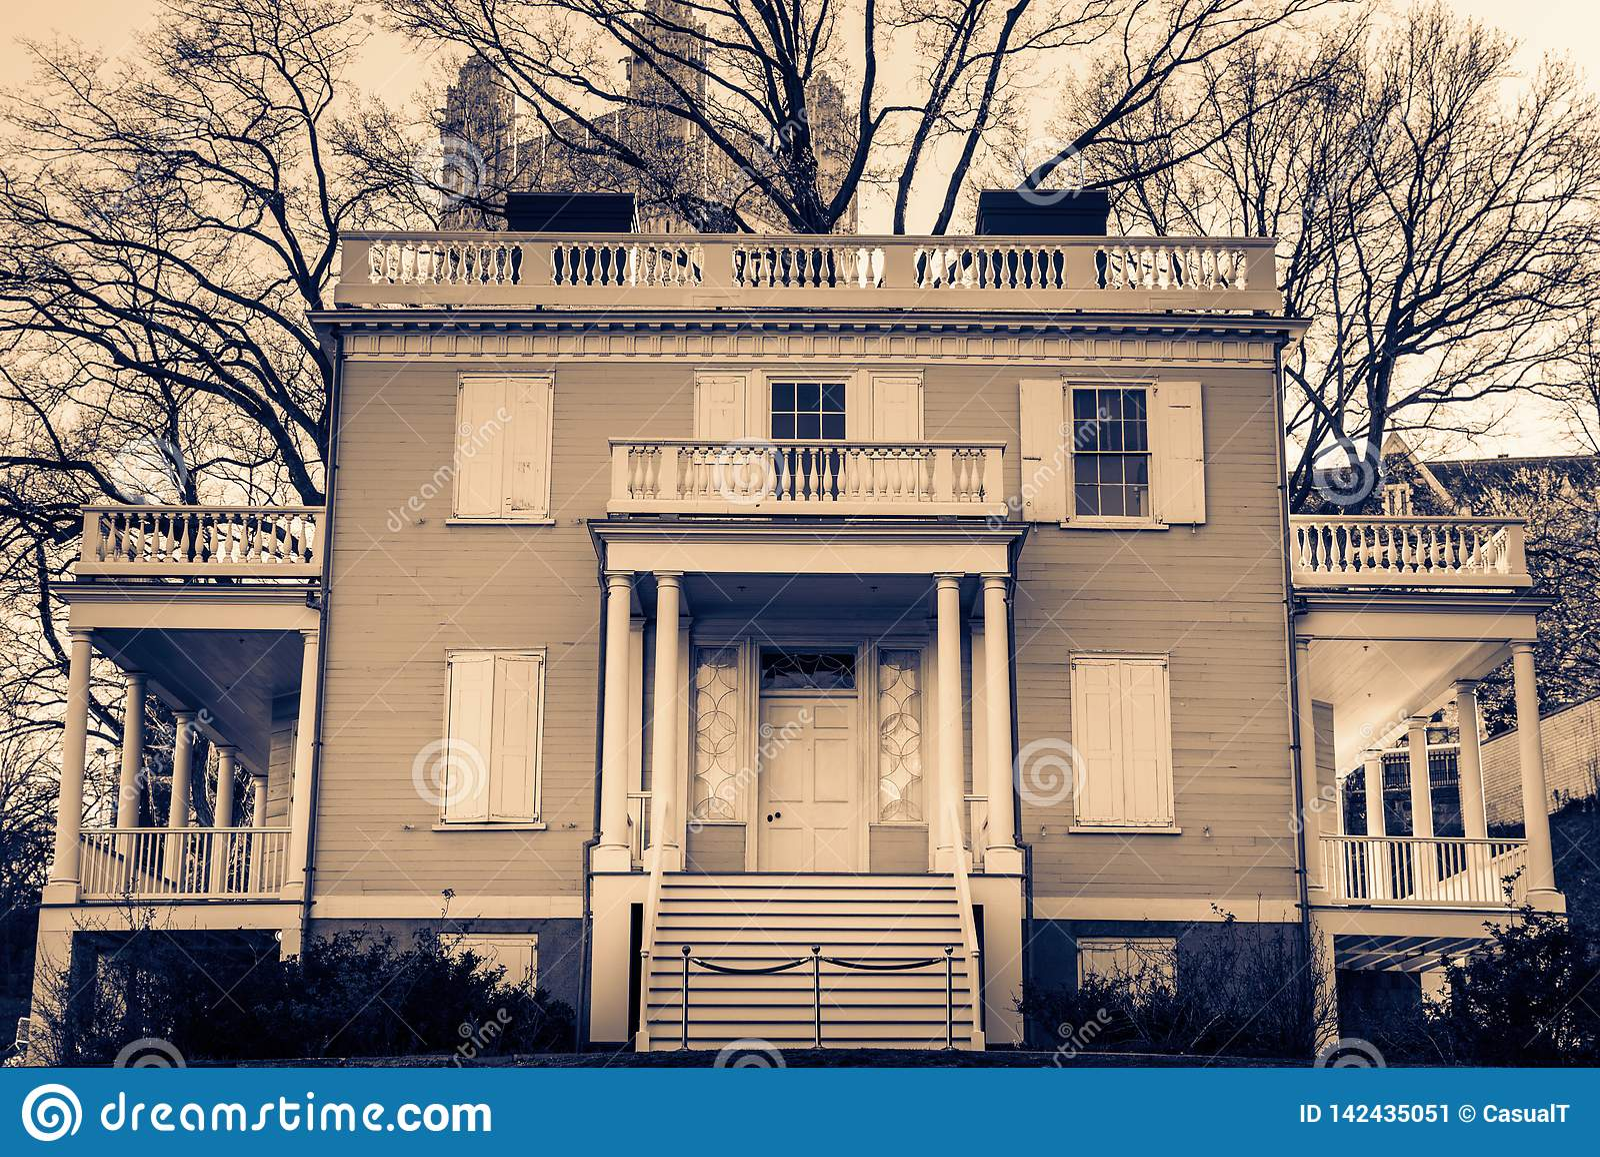 Hamilton Grange alla st Nicholas Park in Harlem, Manhattan, New York, NY, U.S.A.